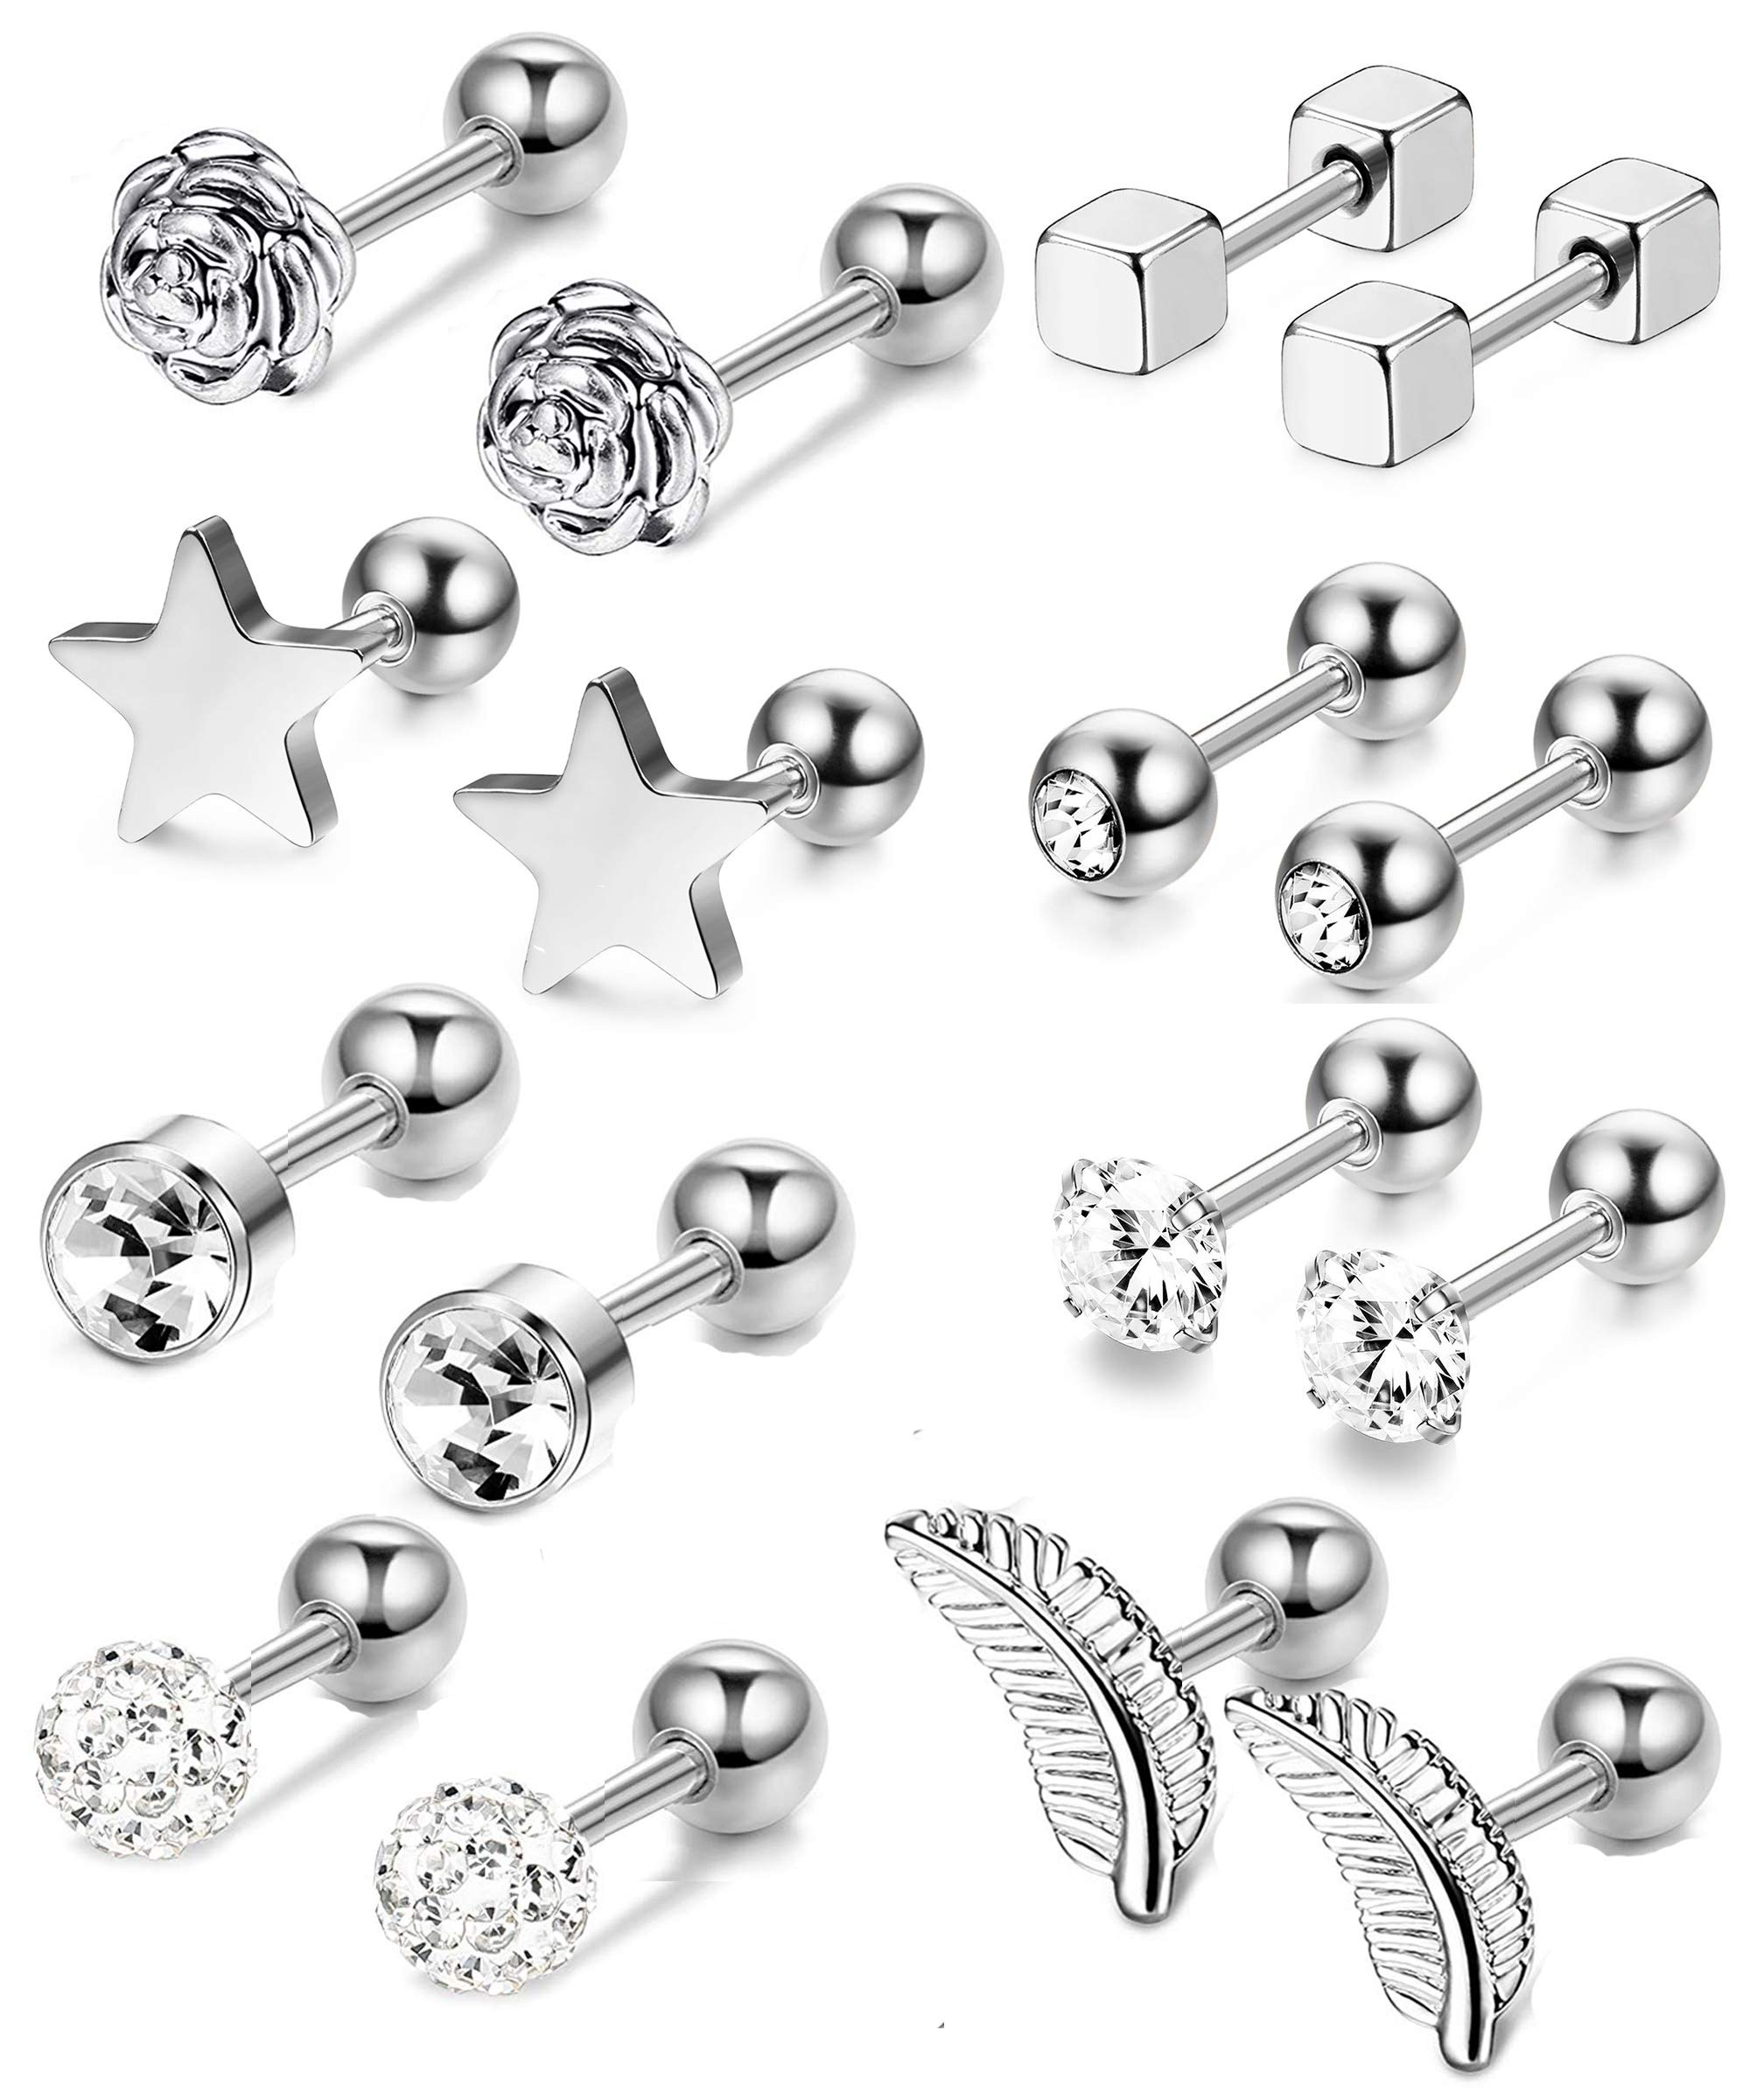 Thunaraz 8Pairs 16G Helix Cartilage Trague Earrings for Women Men Heart Rose Flower Star Earrings Cubic Zirconia Inlaid Cartilage Stud Barbell Ear Piercings Jewelry